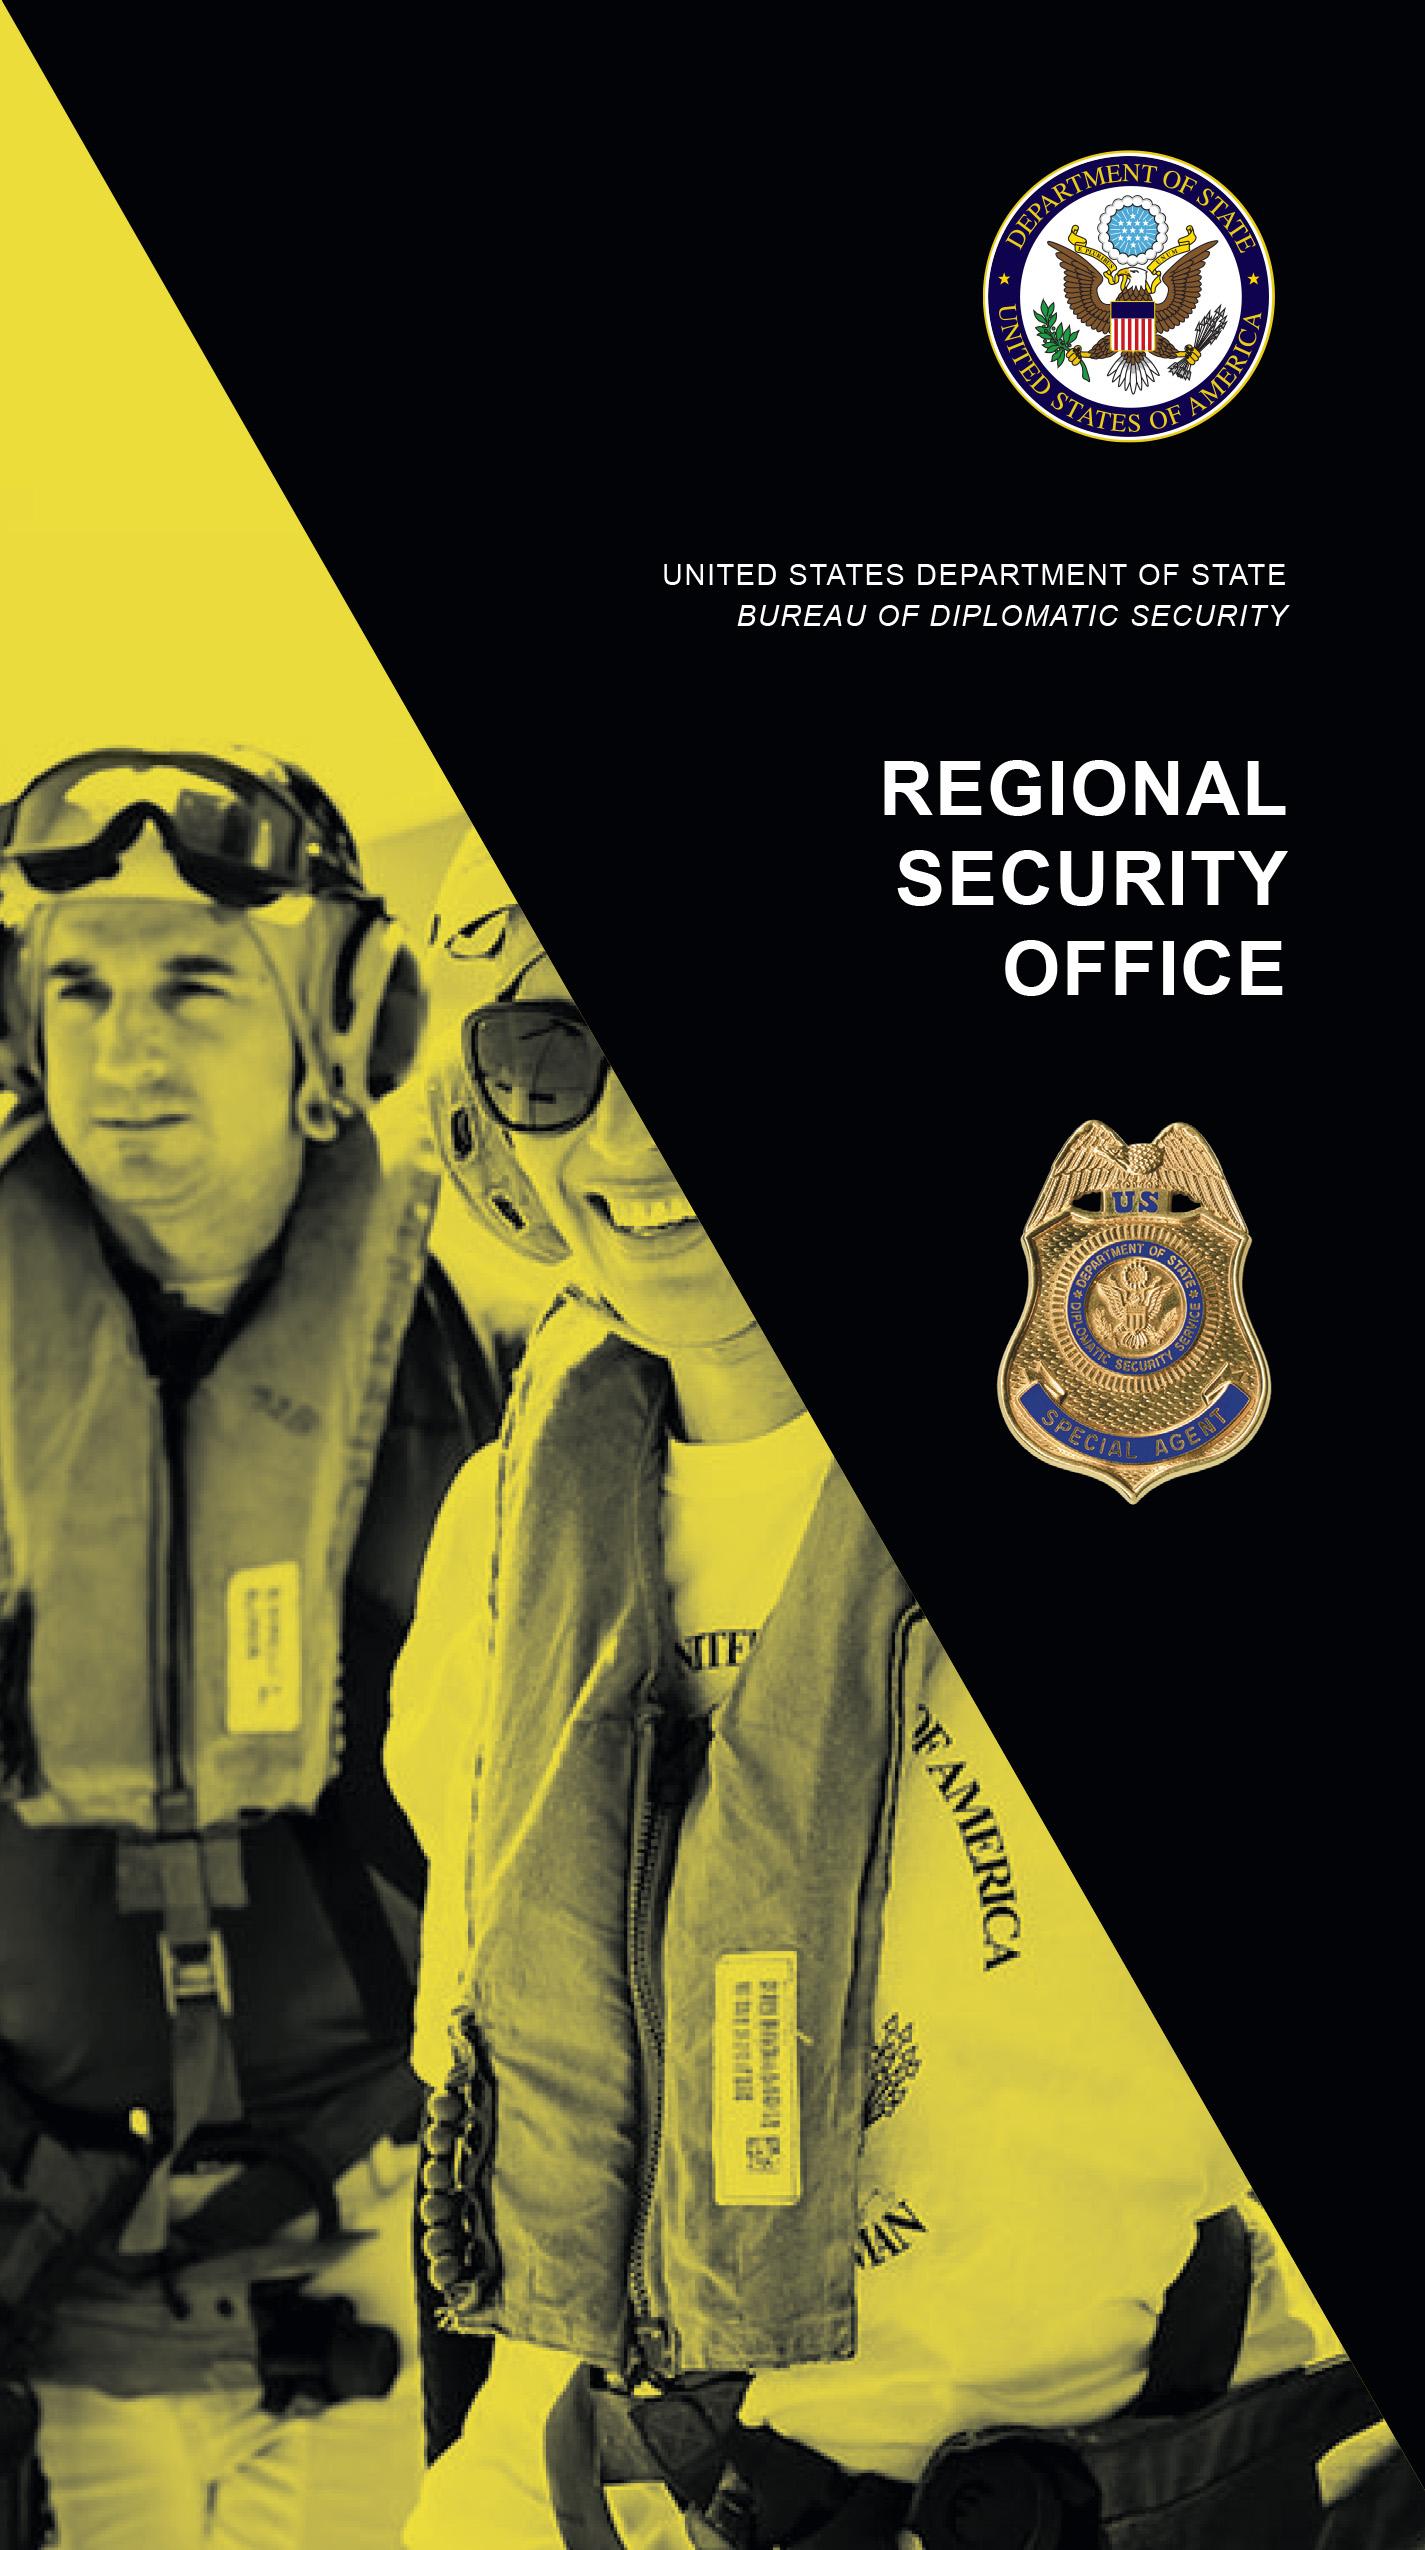 Regional Security Office